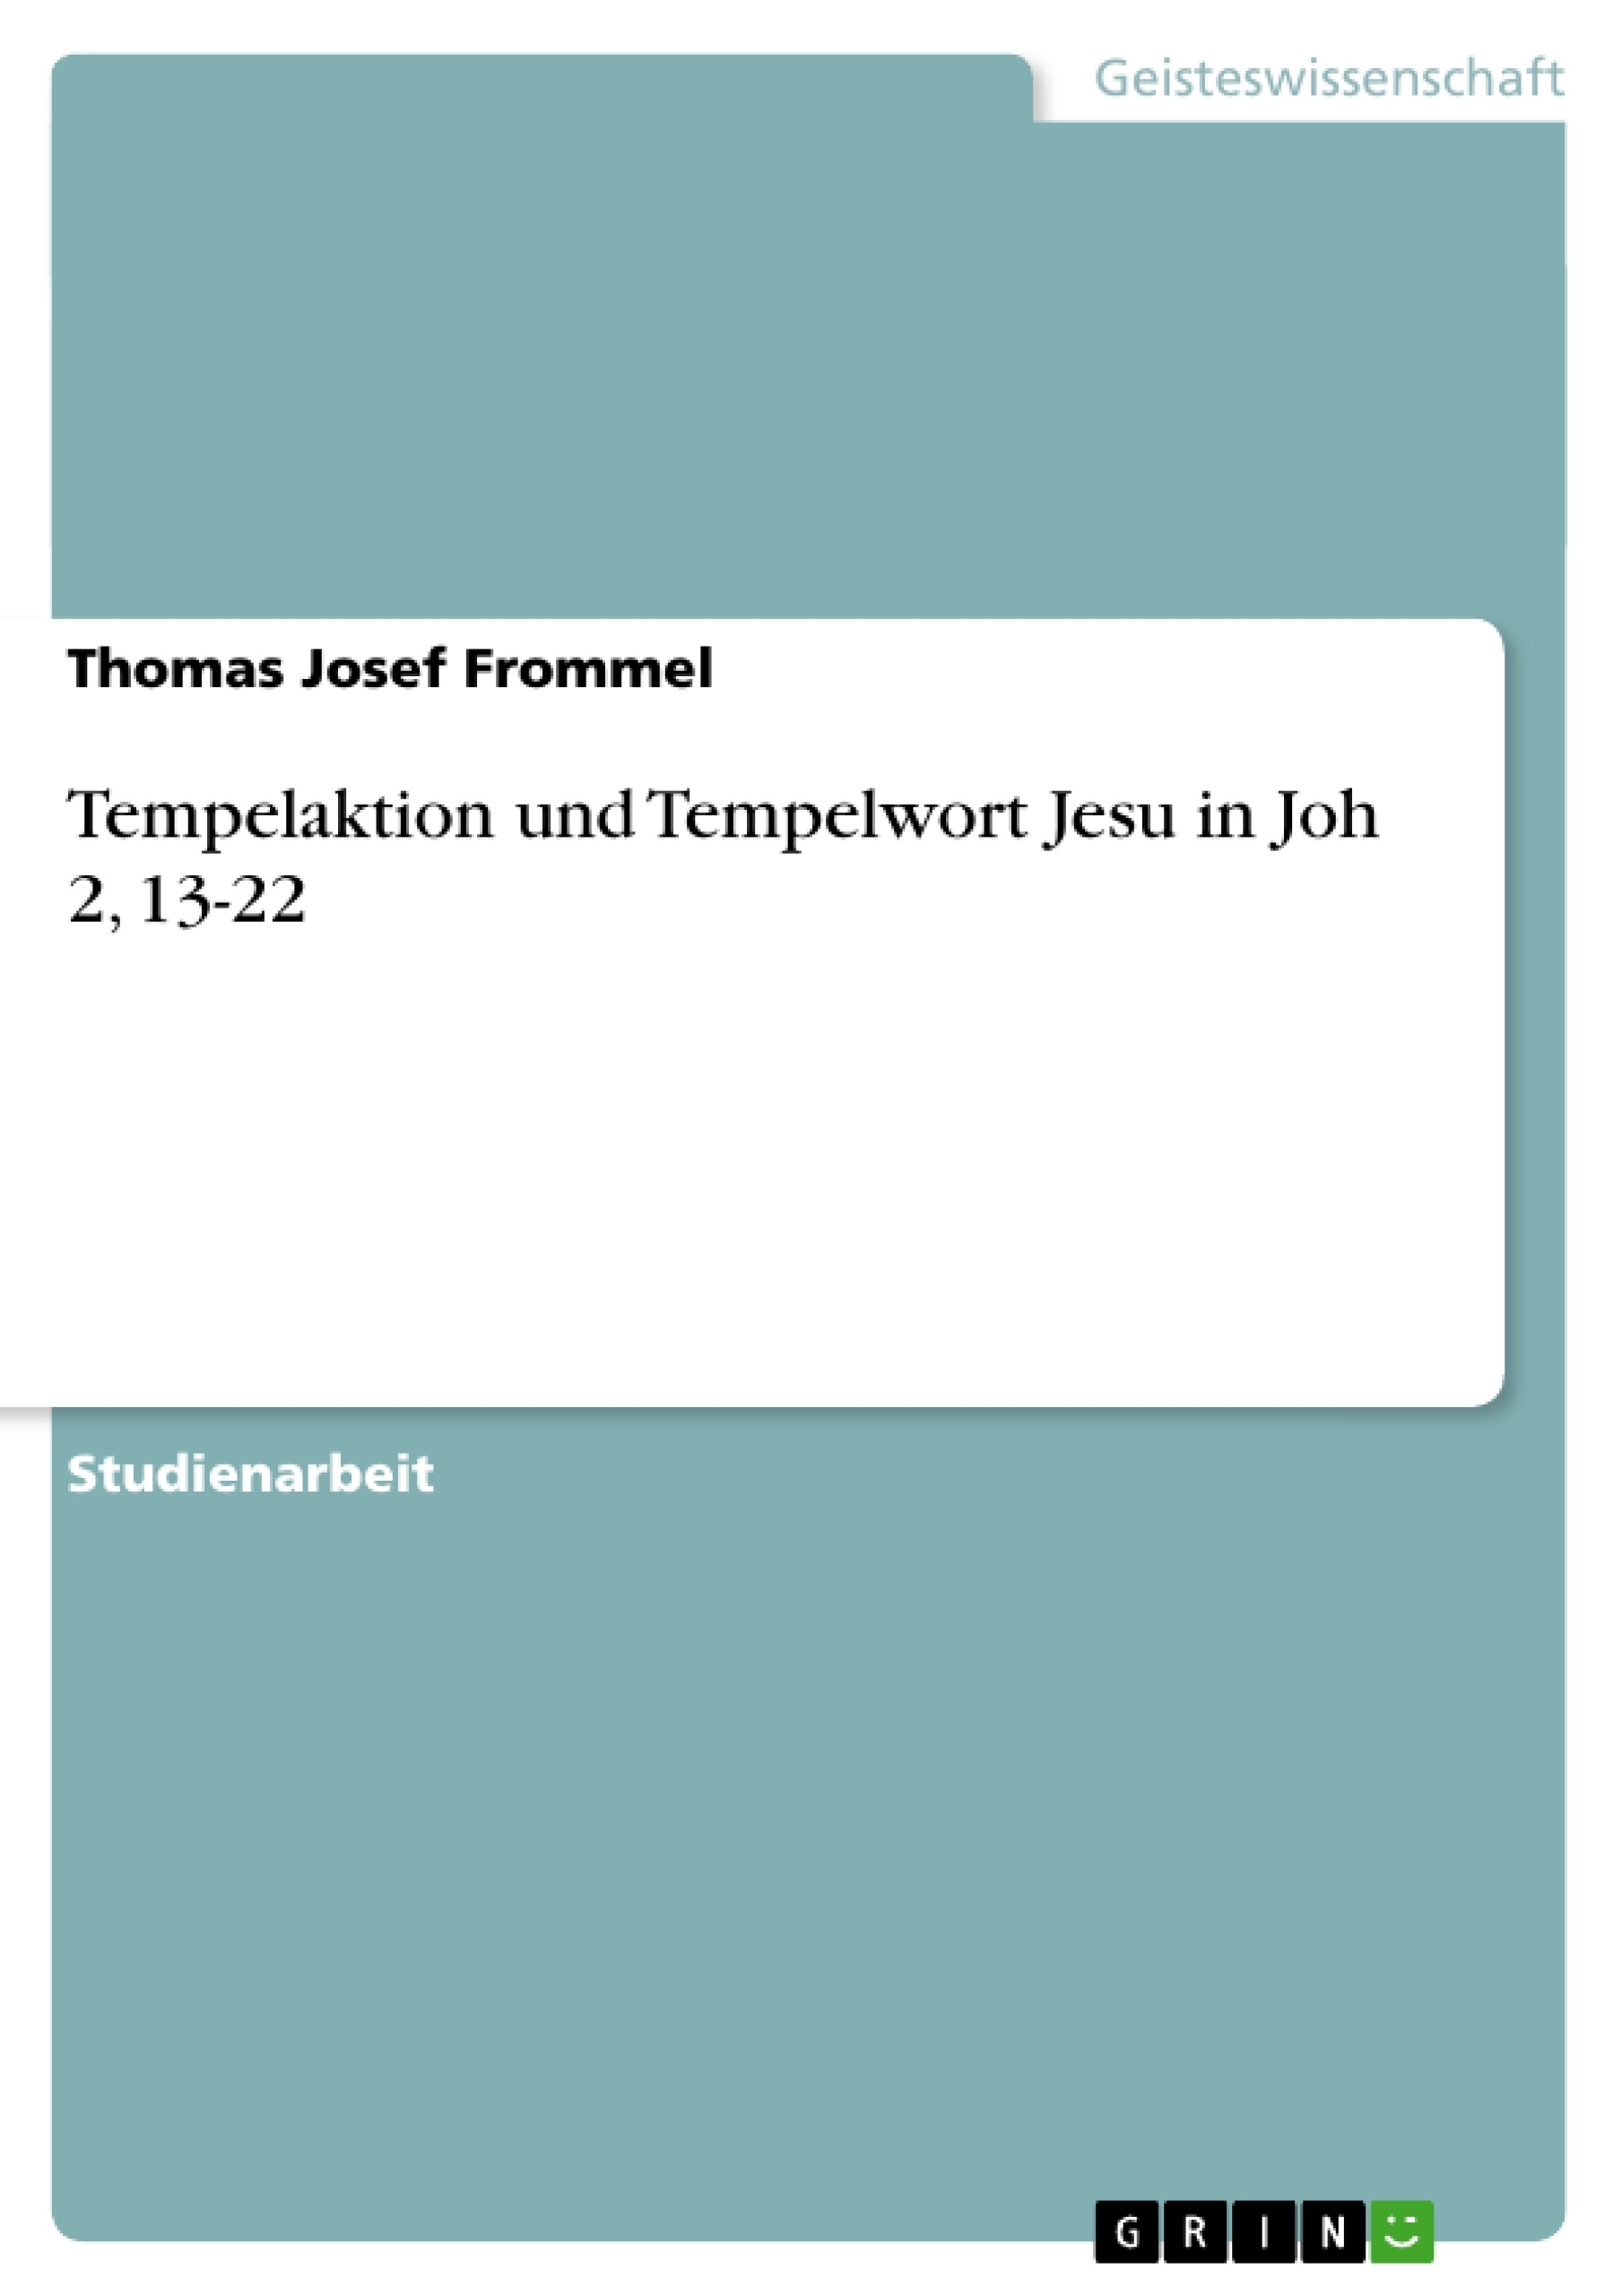 Titel: Tempelaktion und Tempelwort Jesu in Joh 2, 13-22